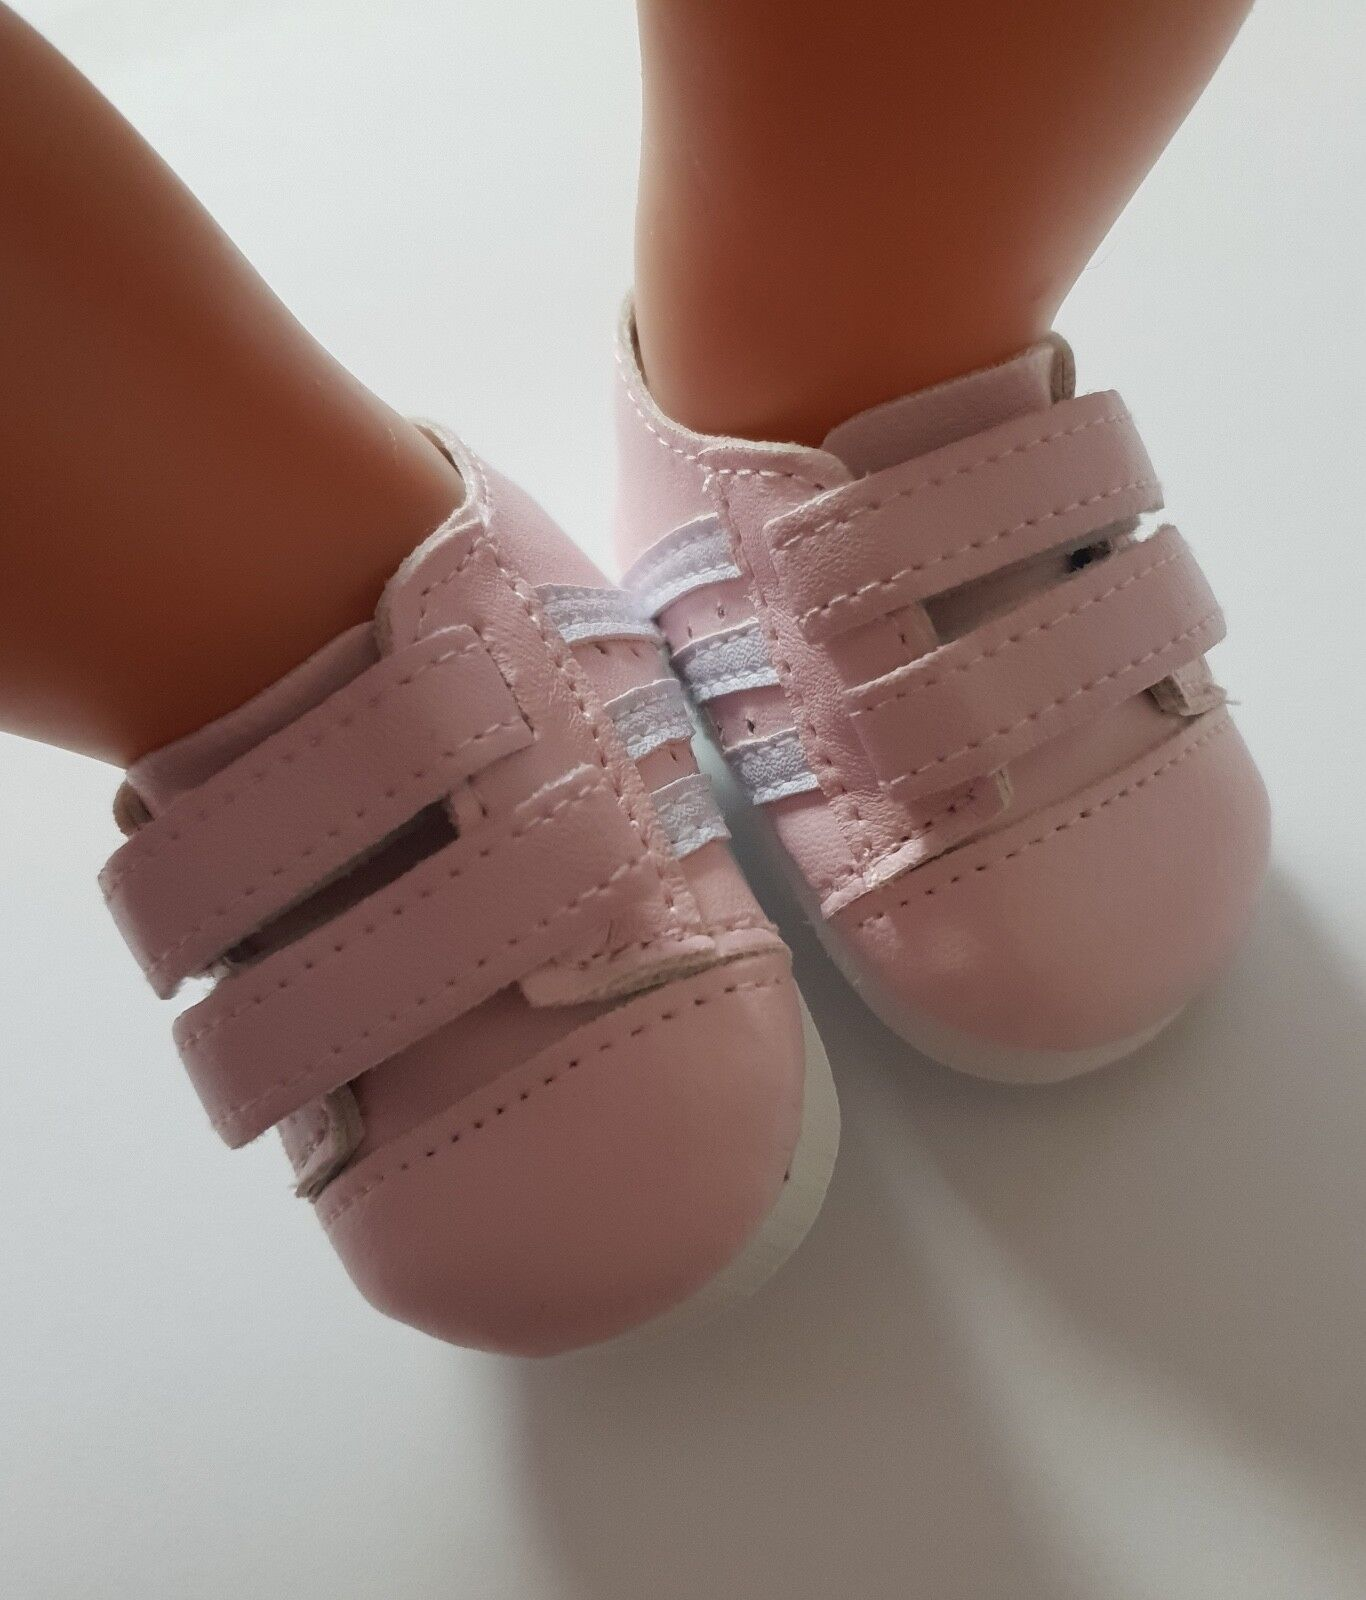 Puppenkleidung, Sneaker, Schuhe, rosa, 43 cm, zb. Baby Born/Sister, NEU